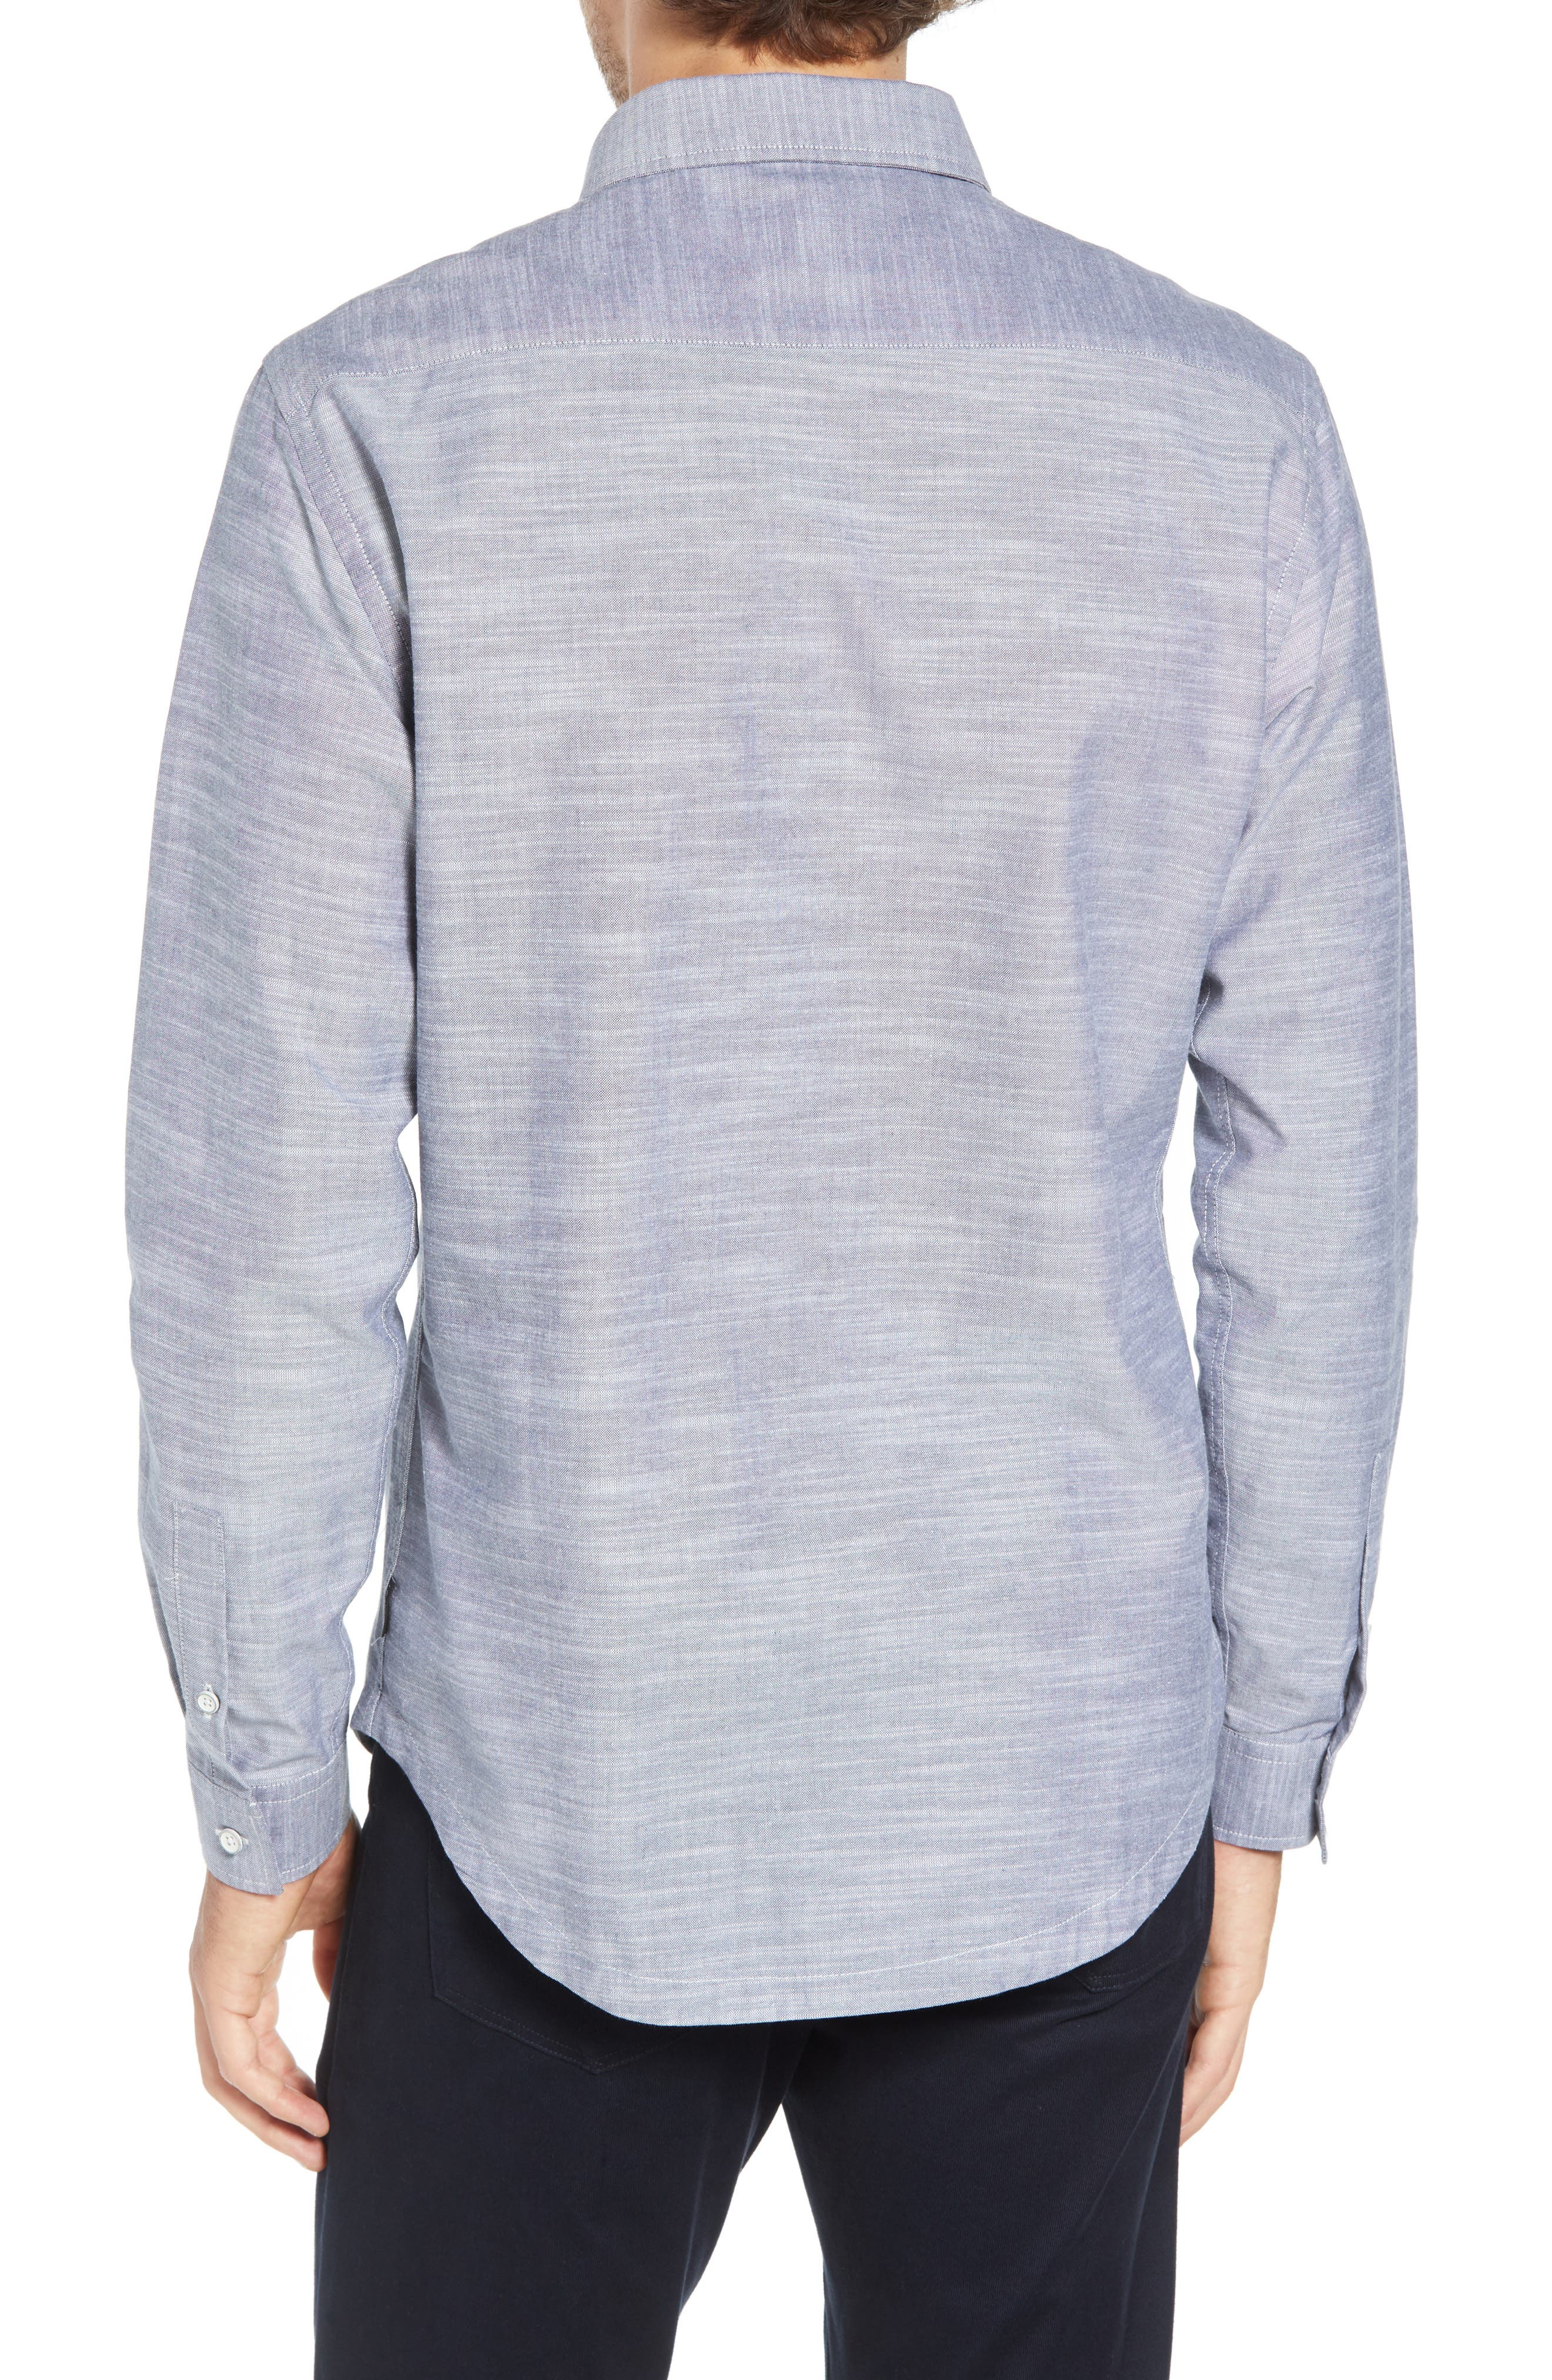 Rugger Regular Fit Sport Shirt,                             Alternate thumbnail 3, color,                             029